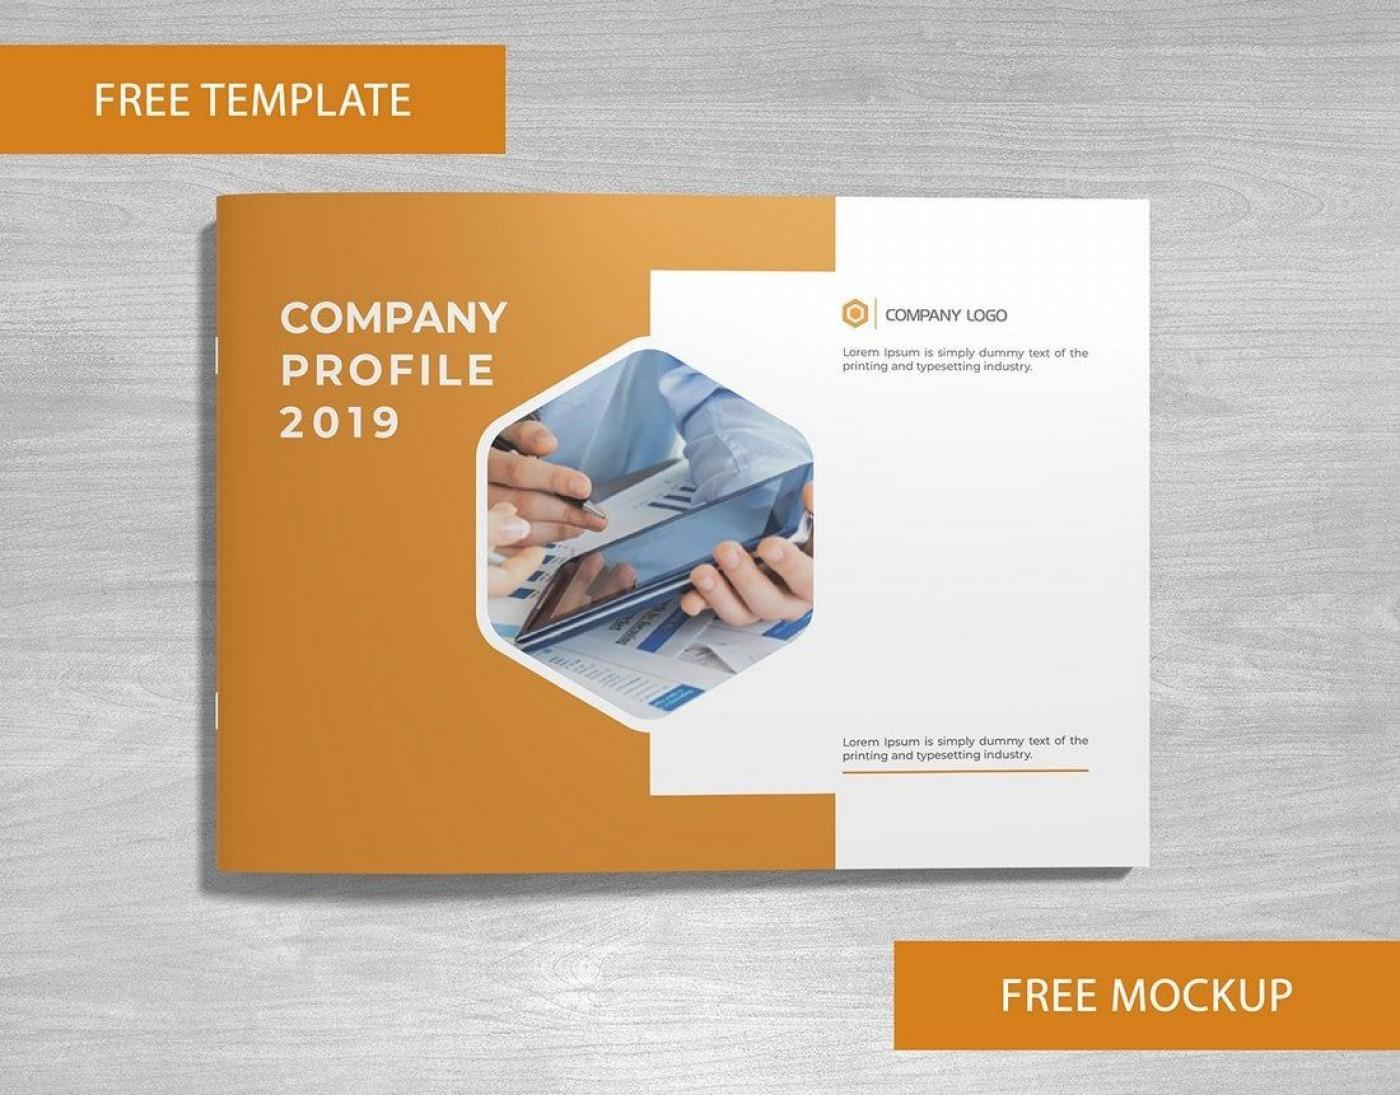 005 Rare Corporate Brochure Design Template Psd Free Download Inspiration  Hotel1400